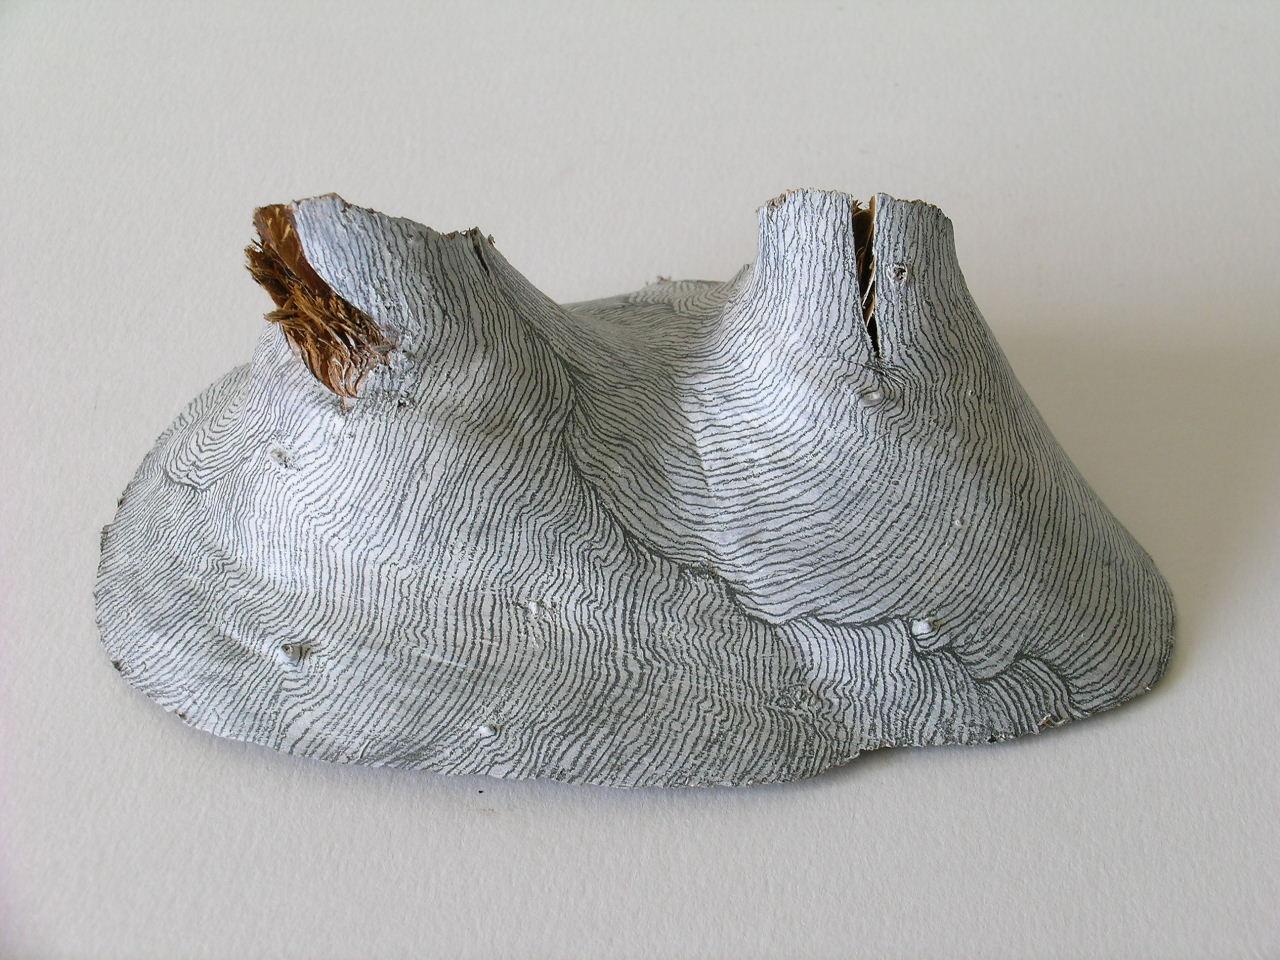 Residual Landscapes (i)   (rear view), Pine off cut, gesso & pencil, 2004